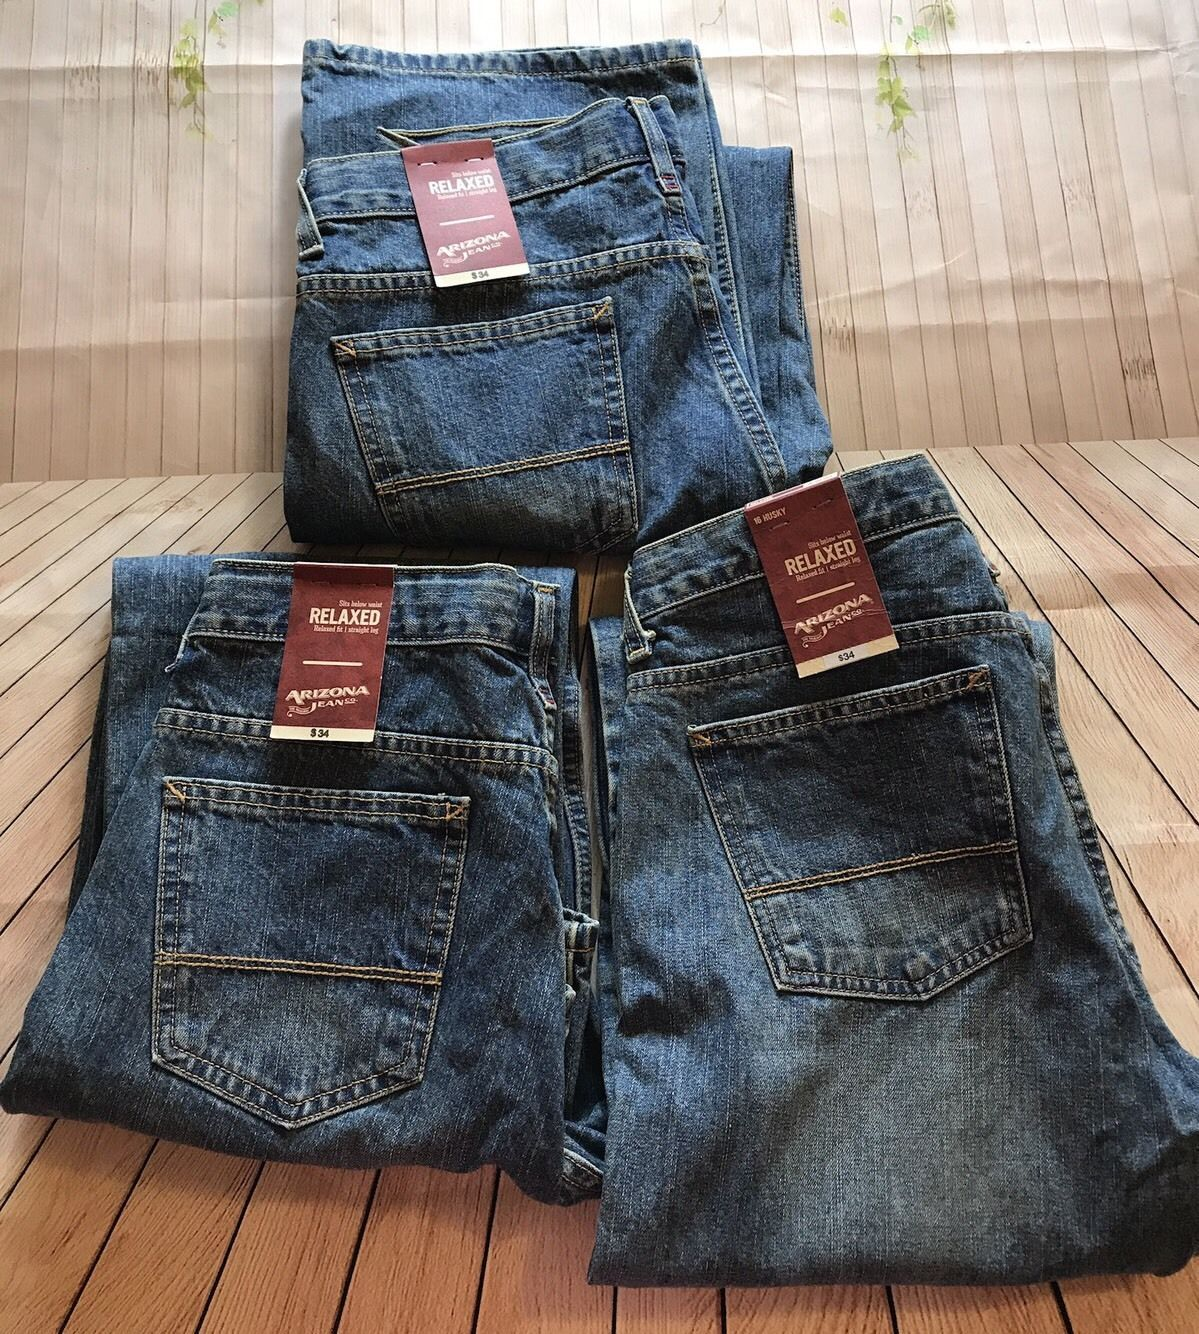 dd2c25fc9dd2b Lot Of 3 Boy s ARIZONA JEAN CO Relaxed Jeans Size 16 Husky Gift ...